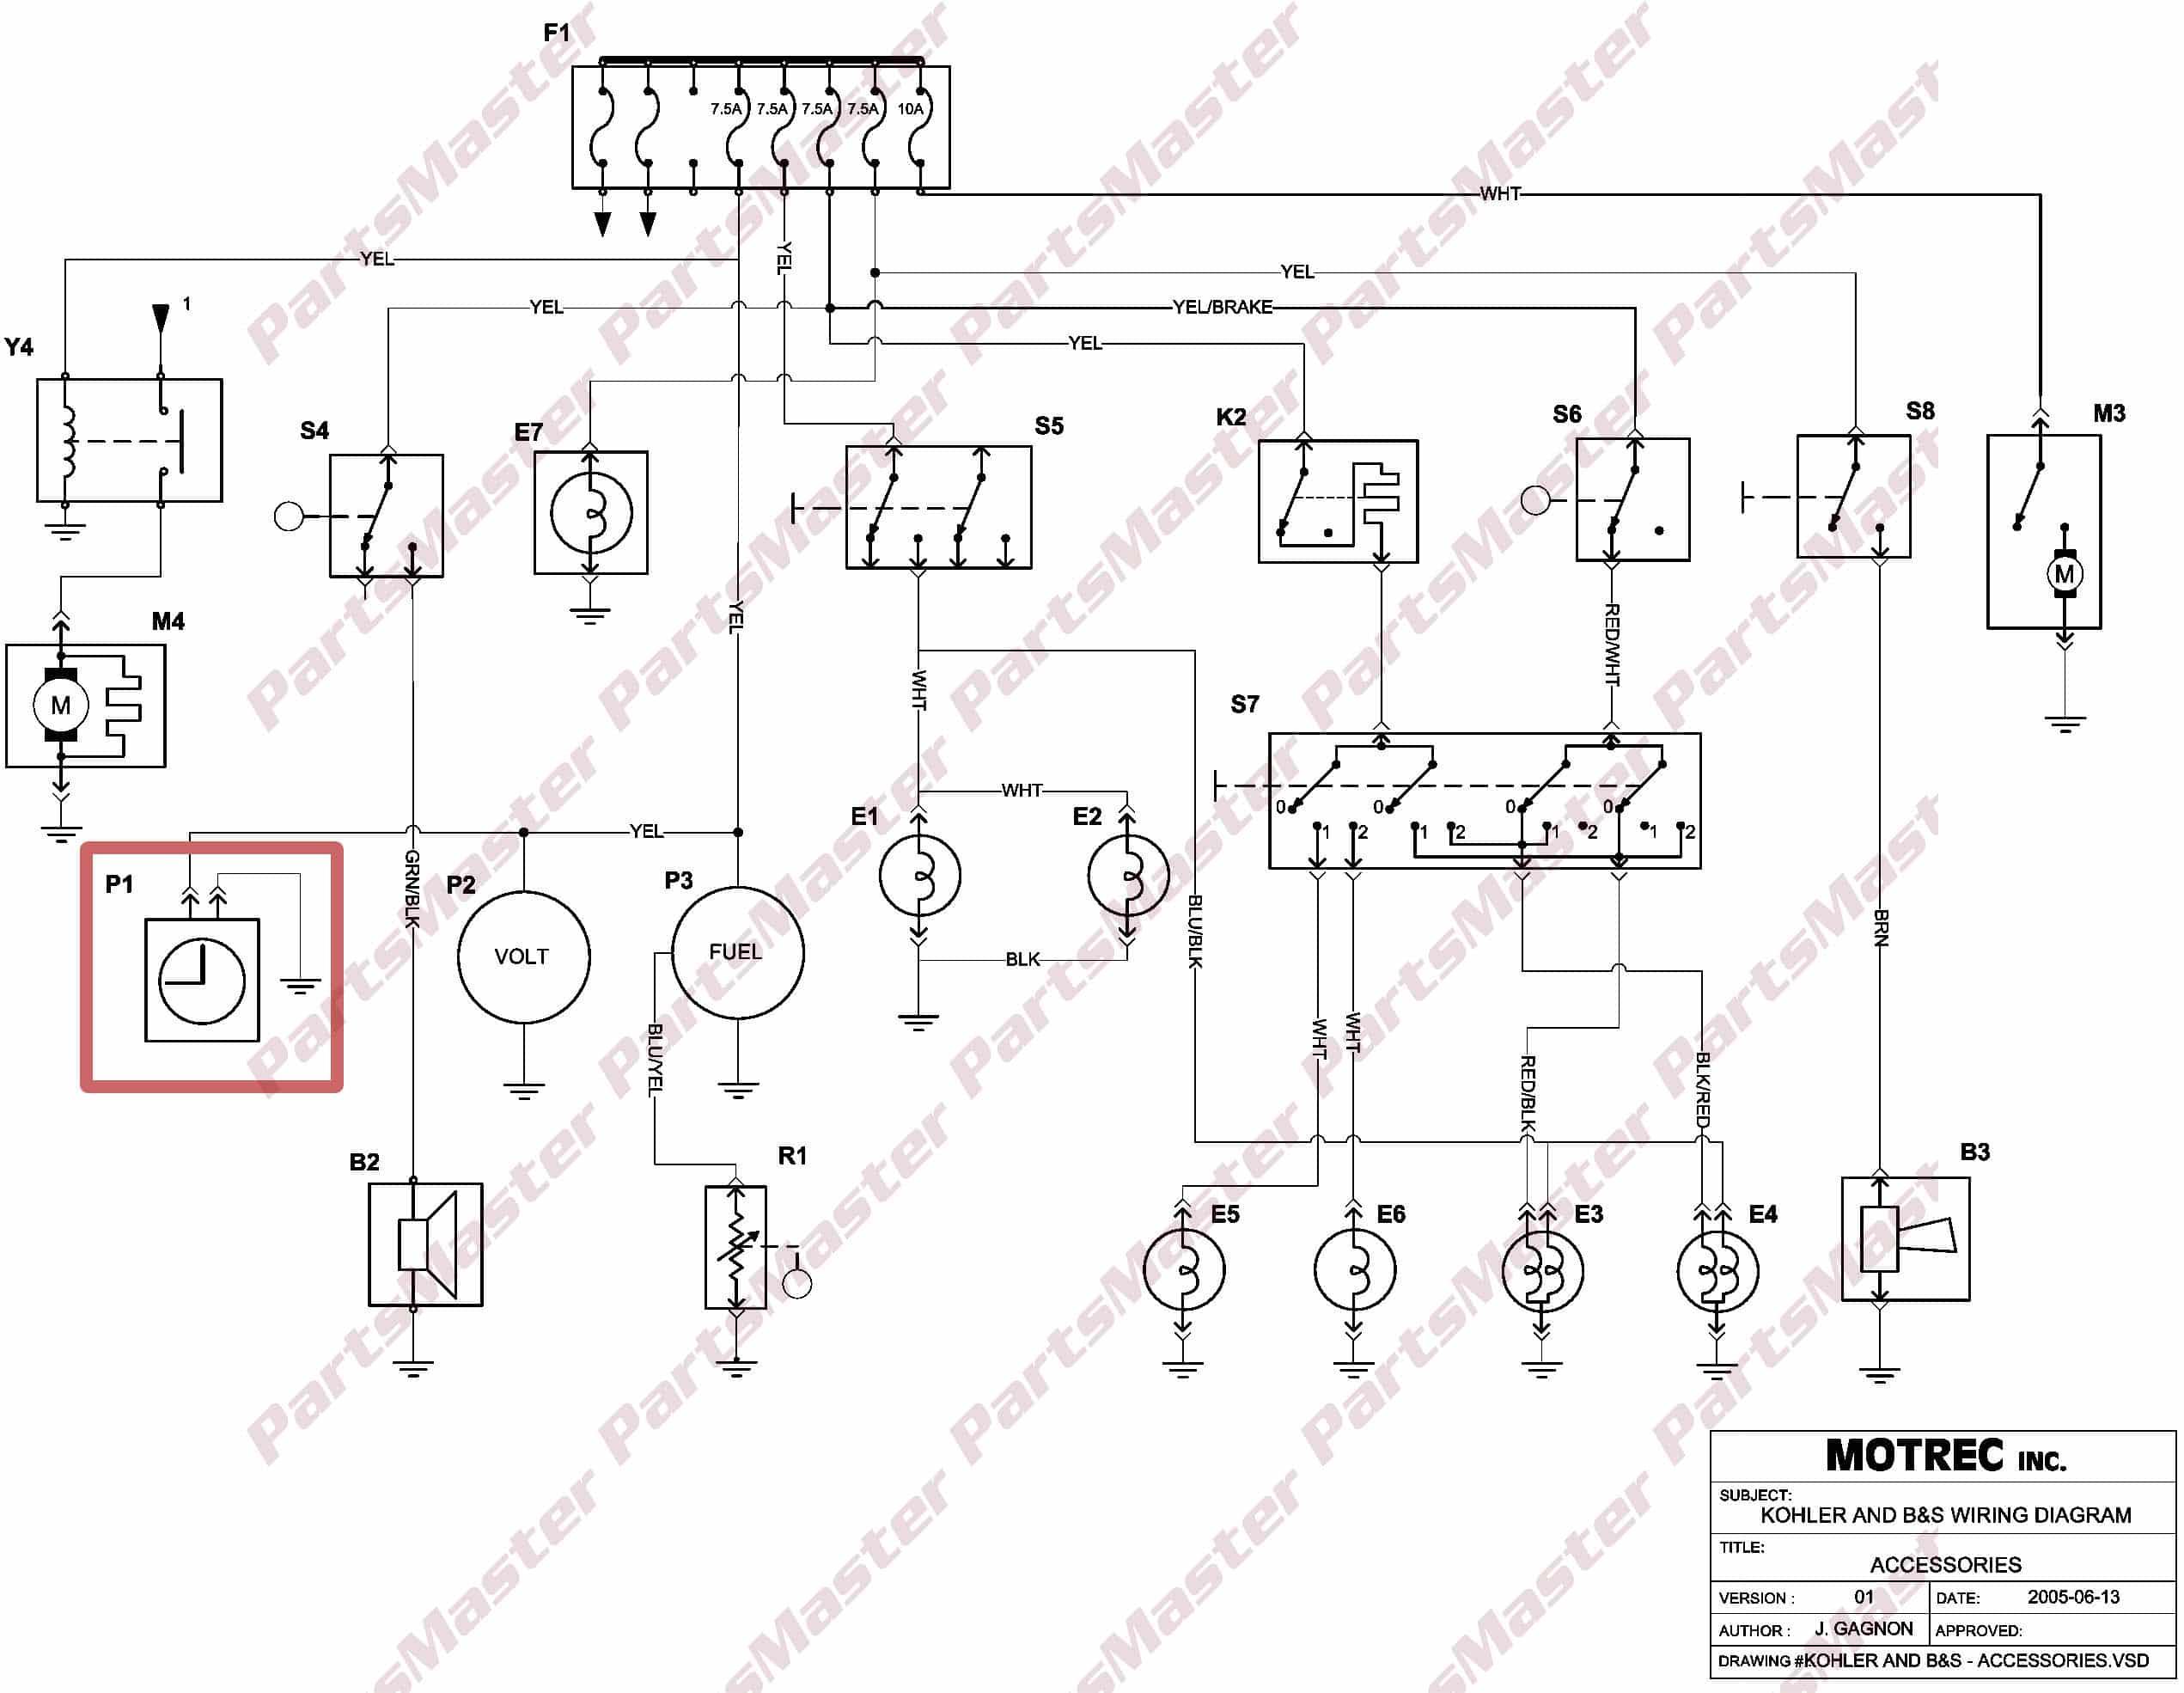 WF_9287] 910 Bluebird Wiring Diagram Free DiagramAtolo Rosz Epsy Pap Mohammedshrine Librar Wiring 101